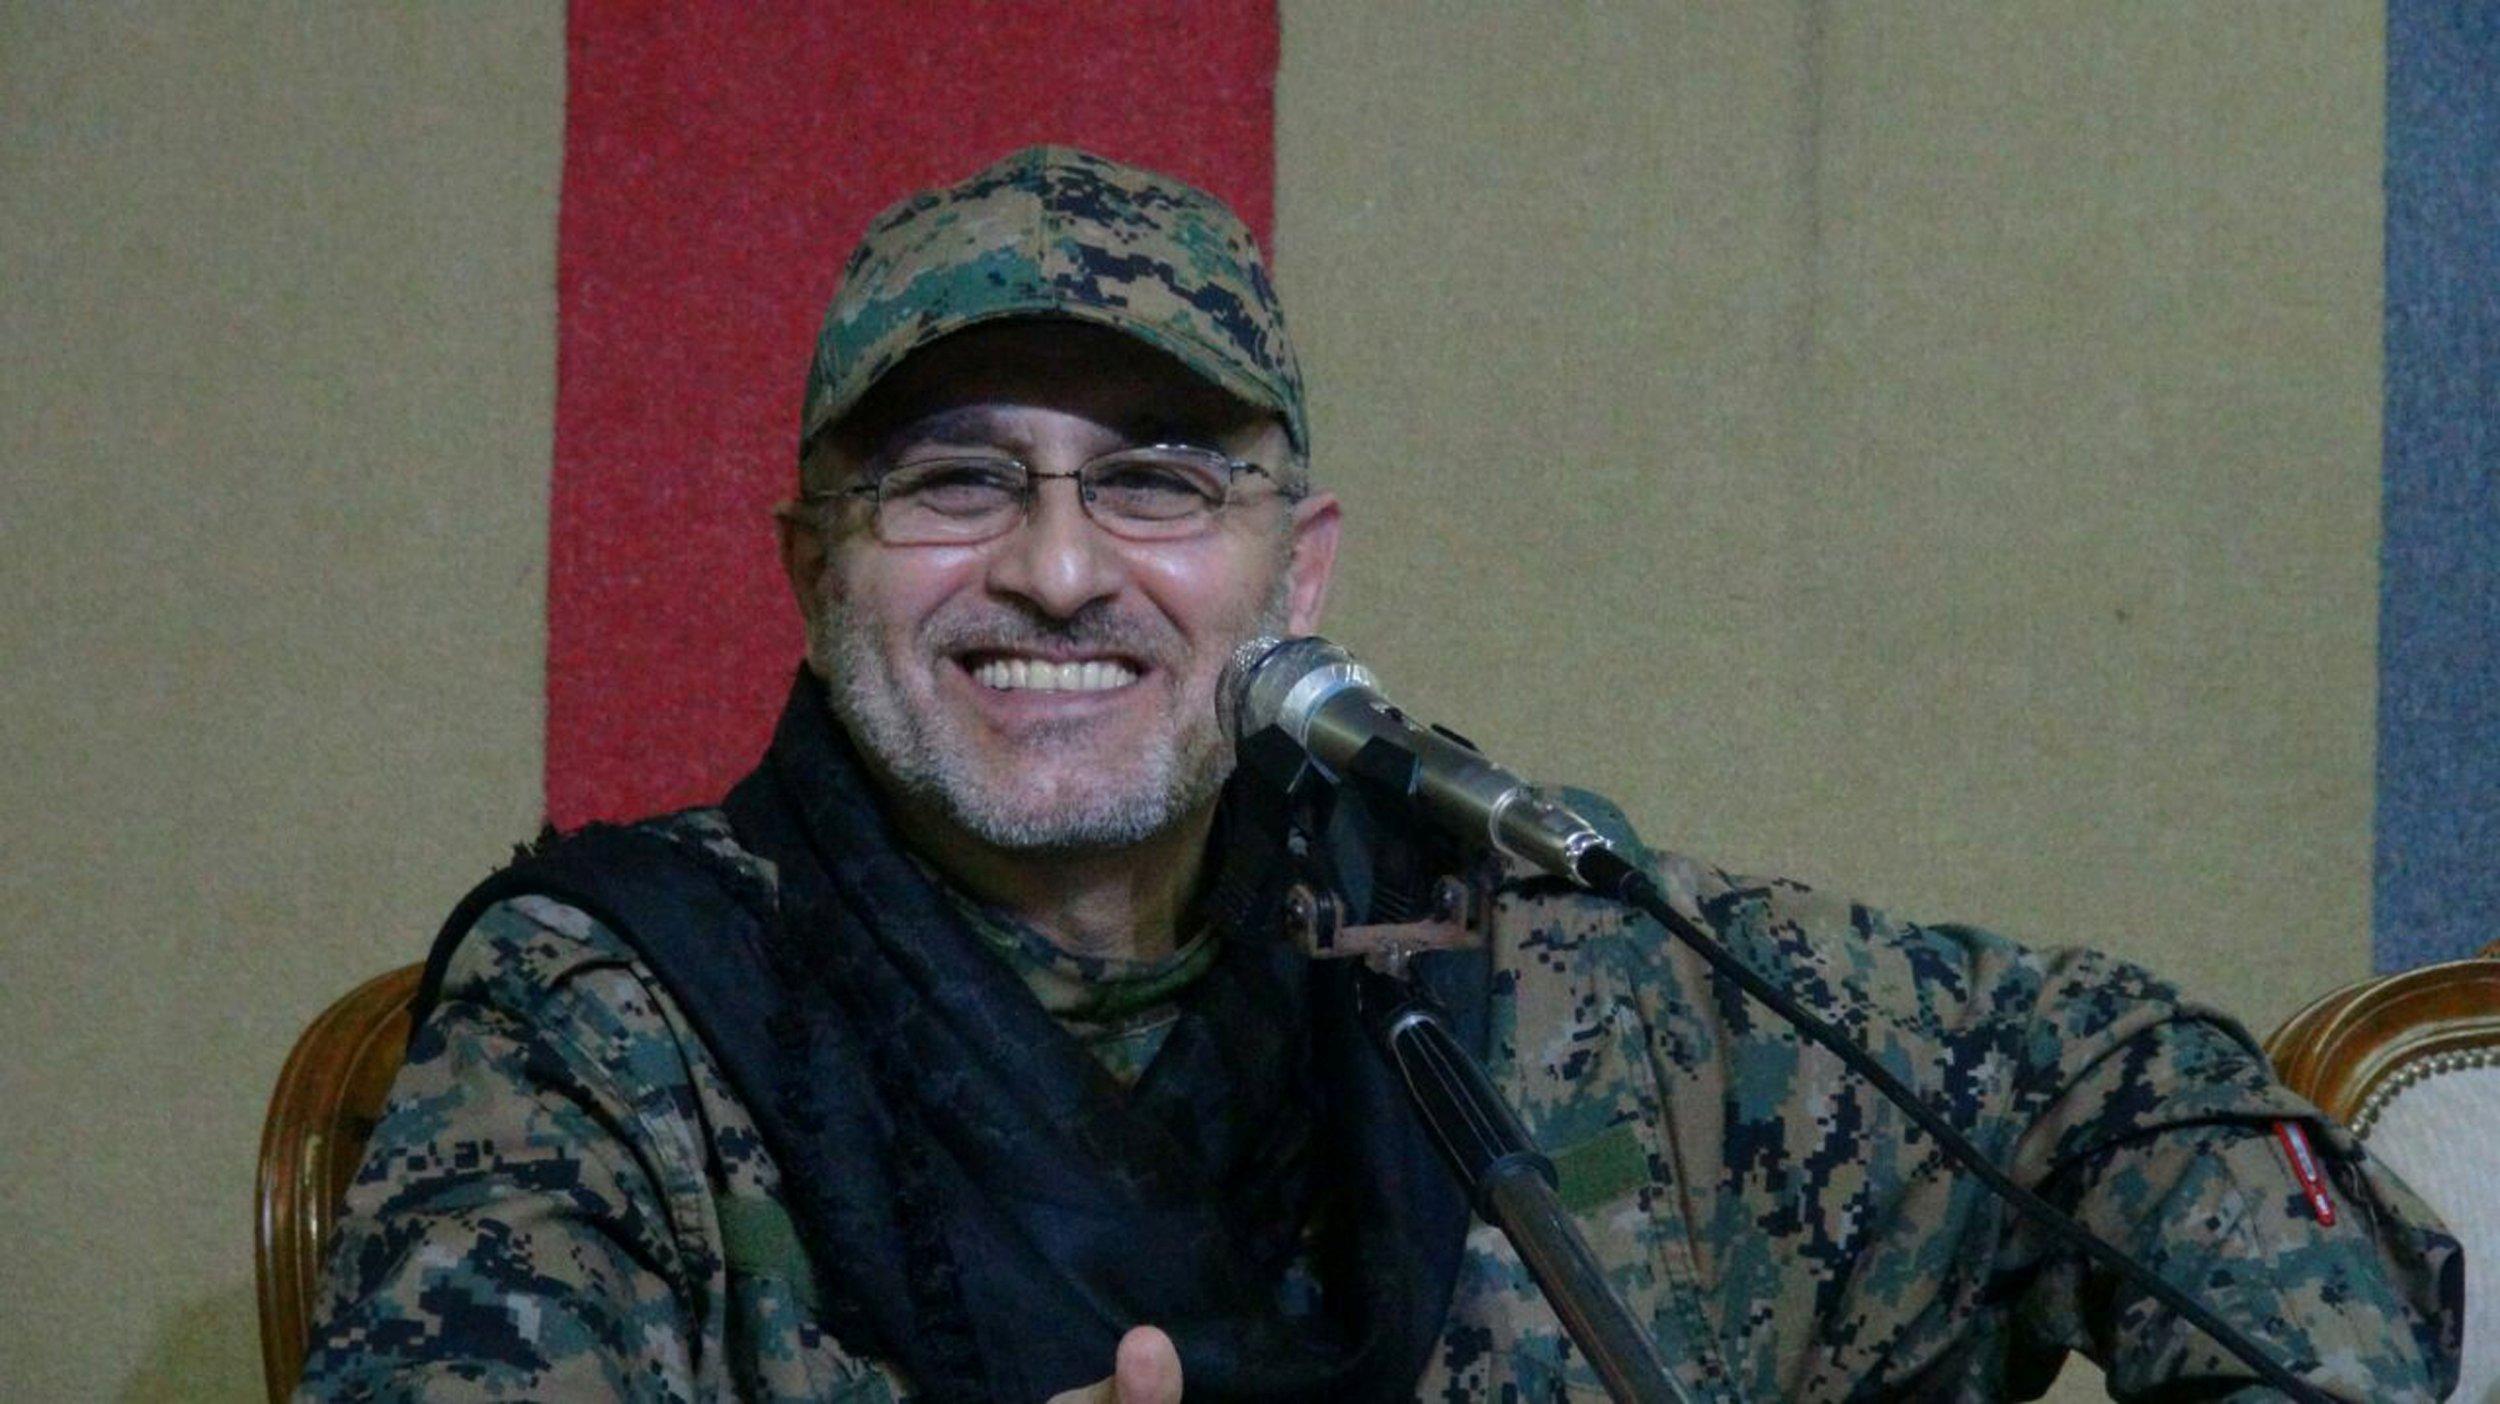 Hezbollah military commander Mustafa Badreddine